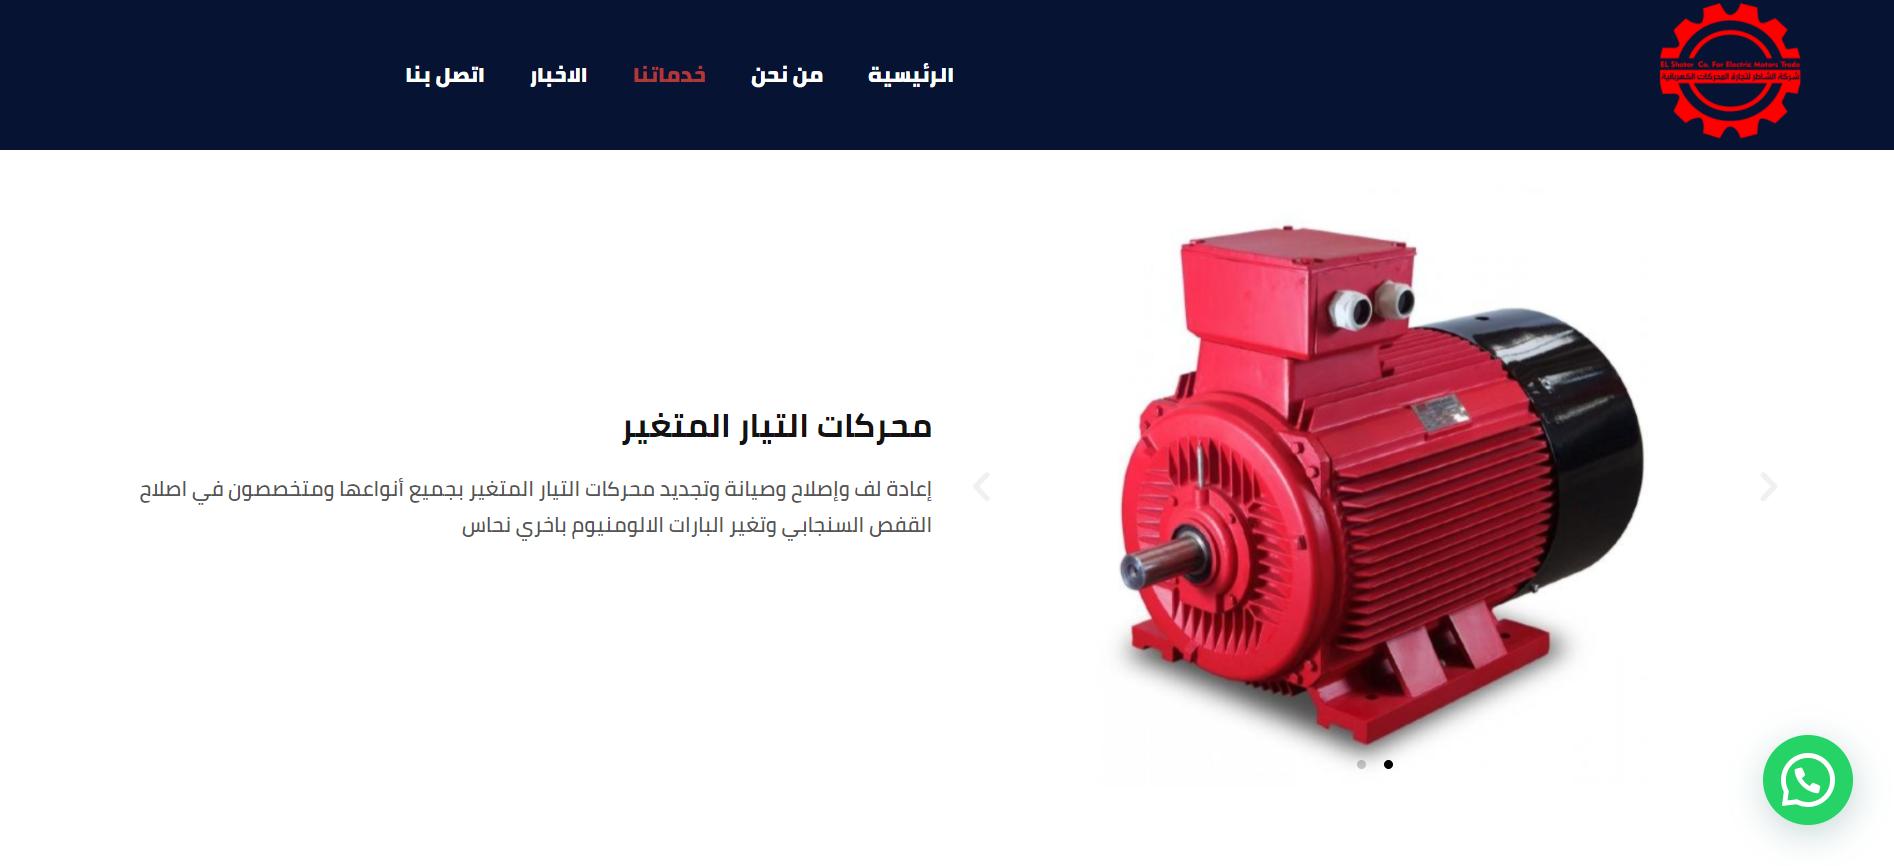 444 - محركات كهربائيه -